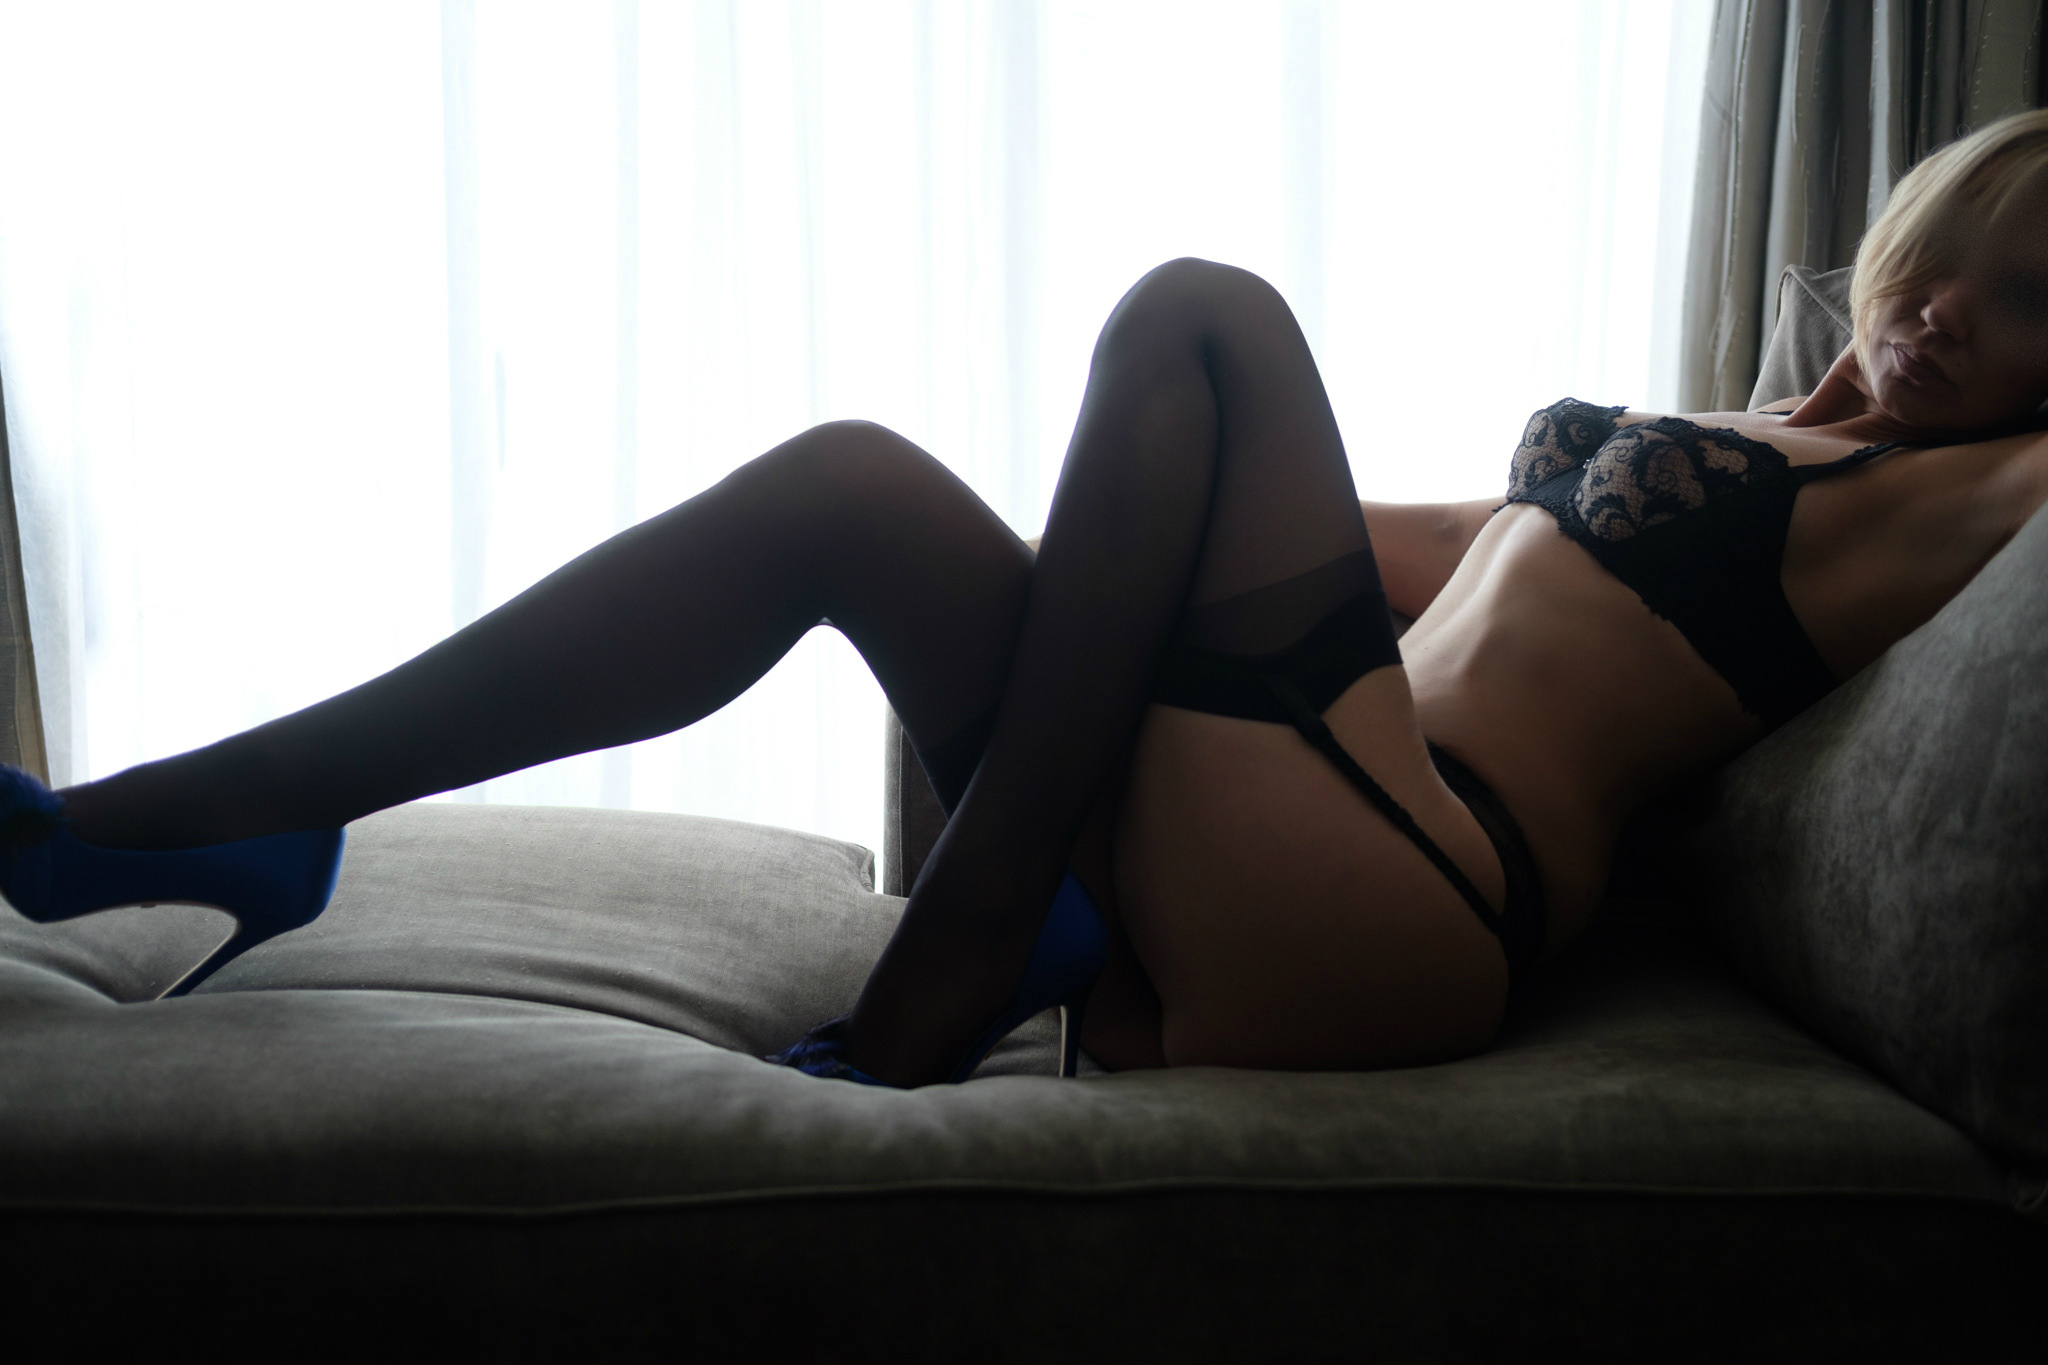 Sasha Cadeaux